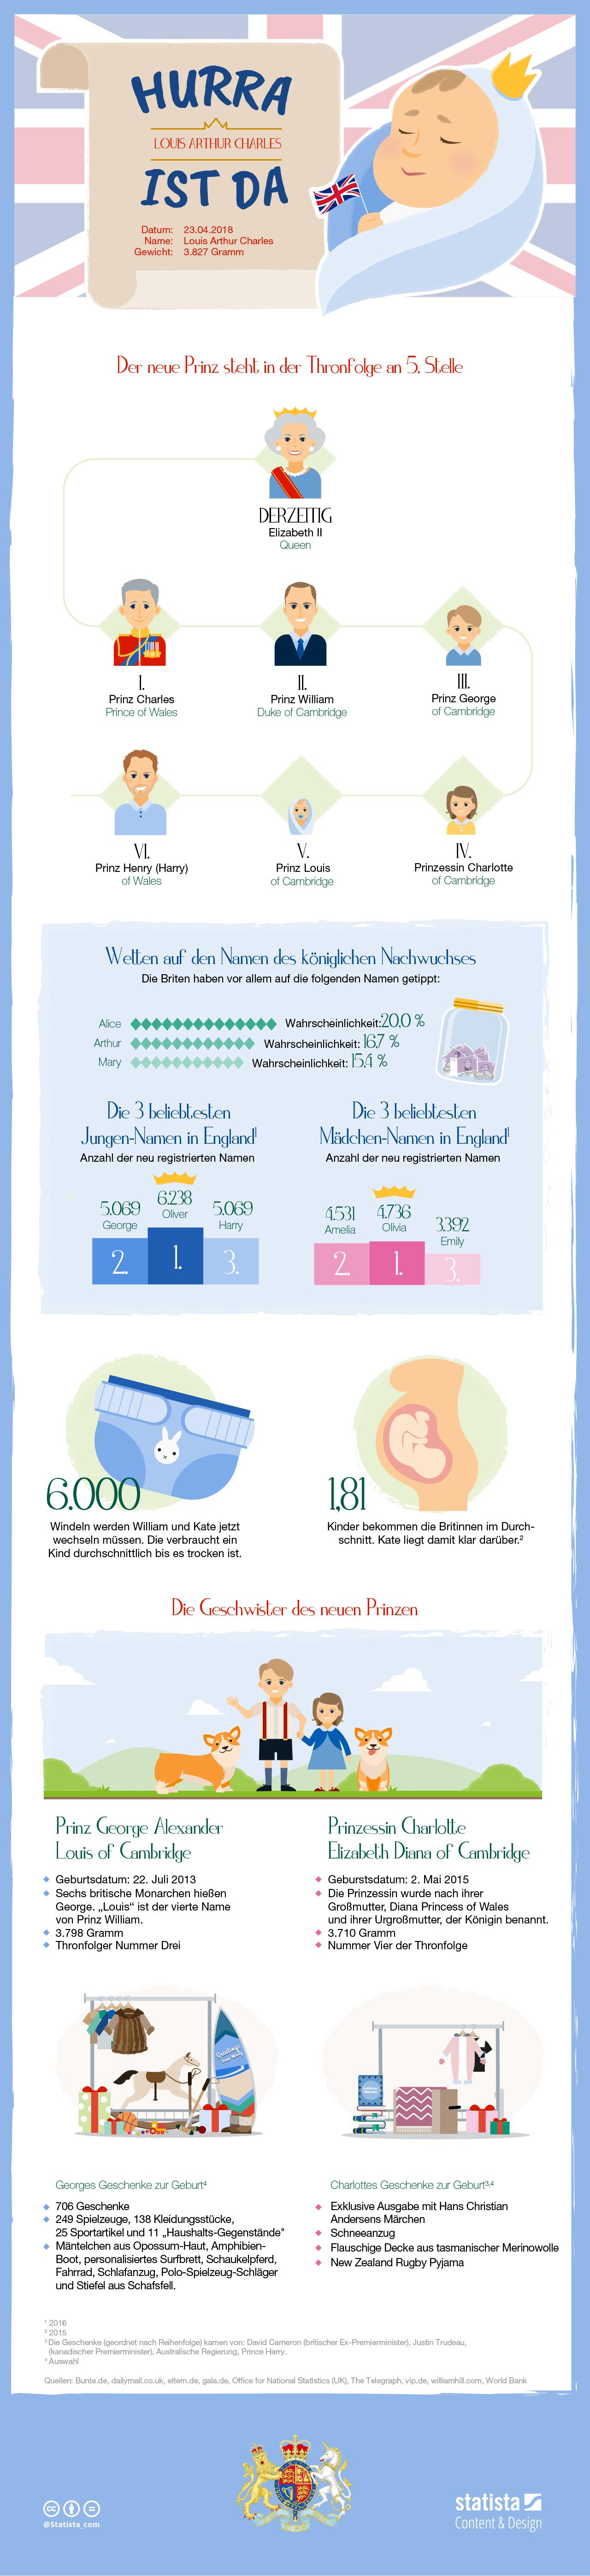 Infografik: Das royale Baby ist da | Statista